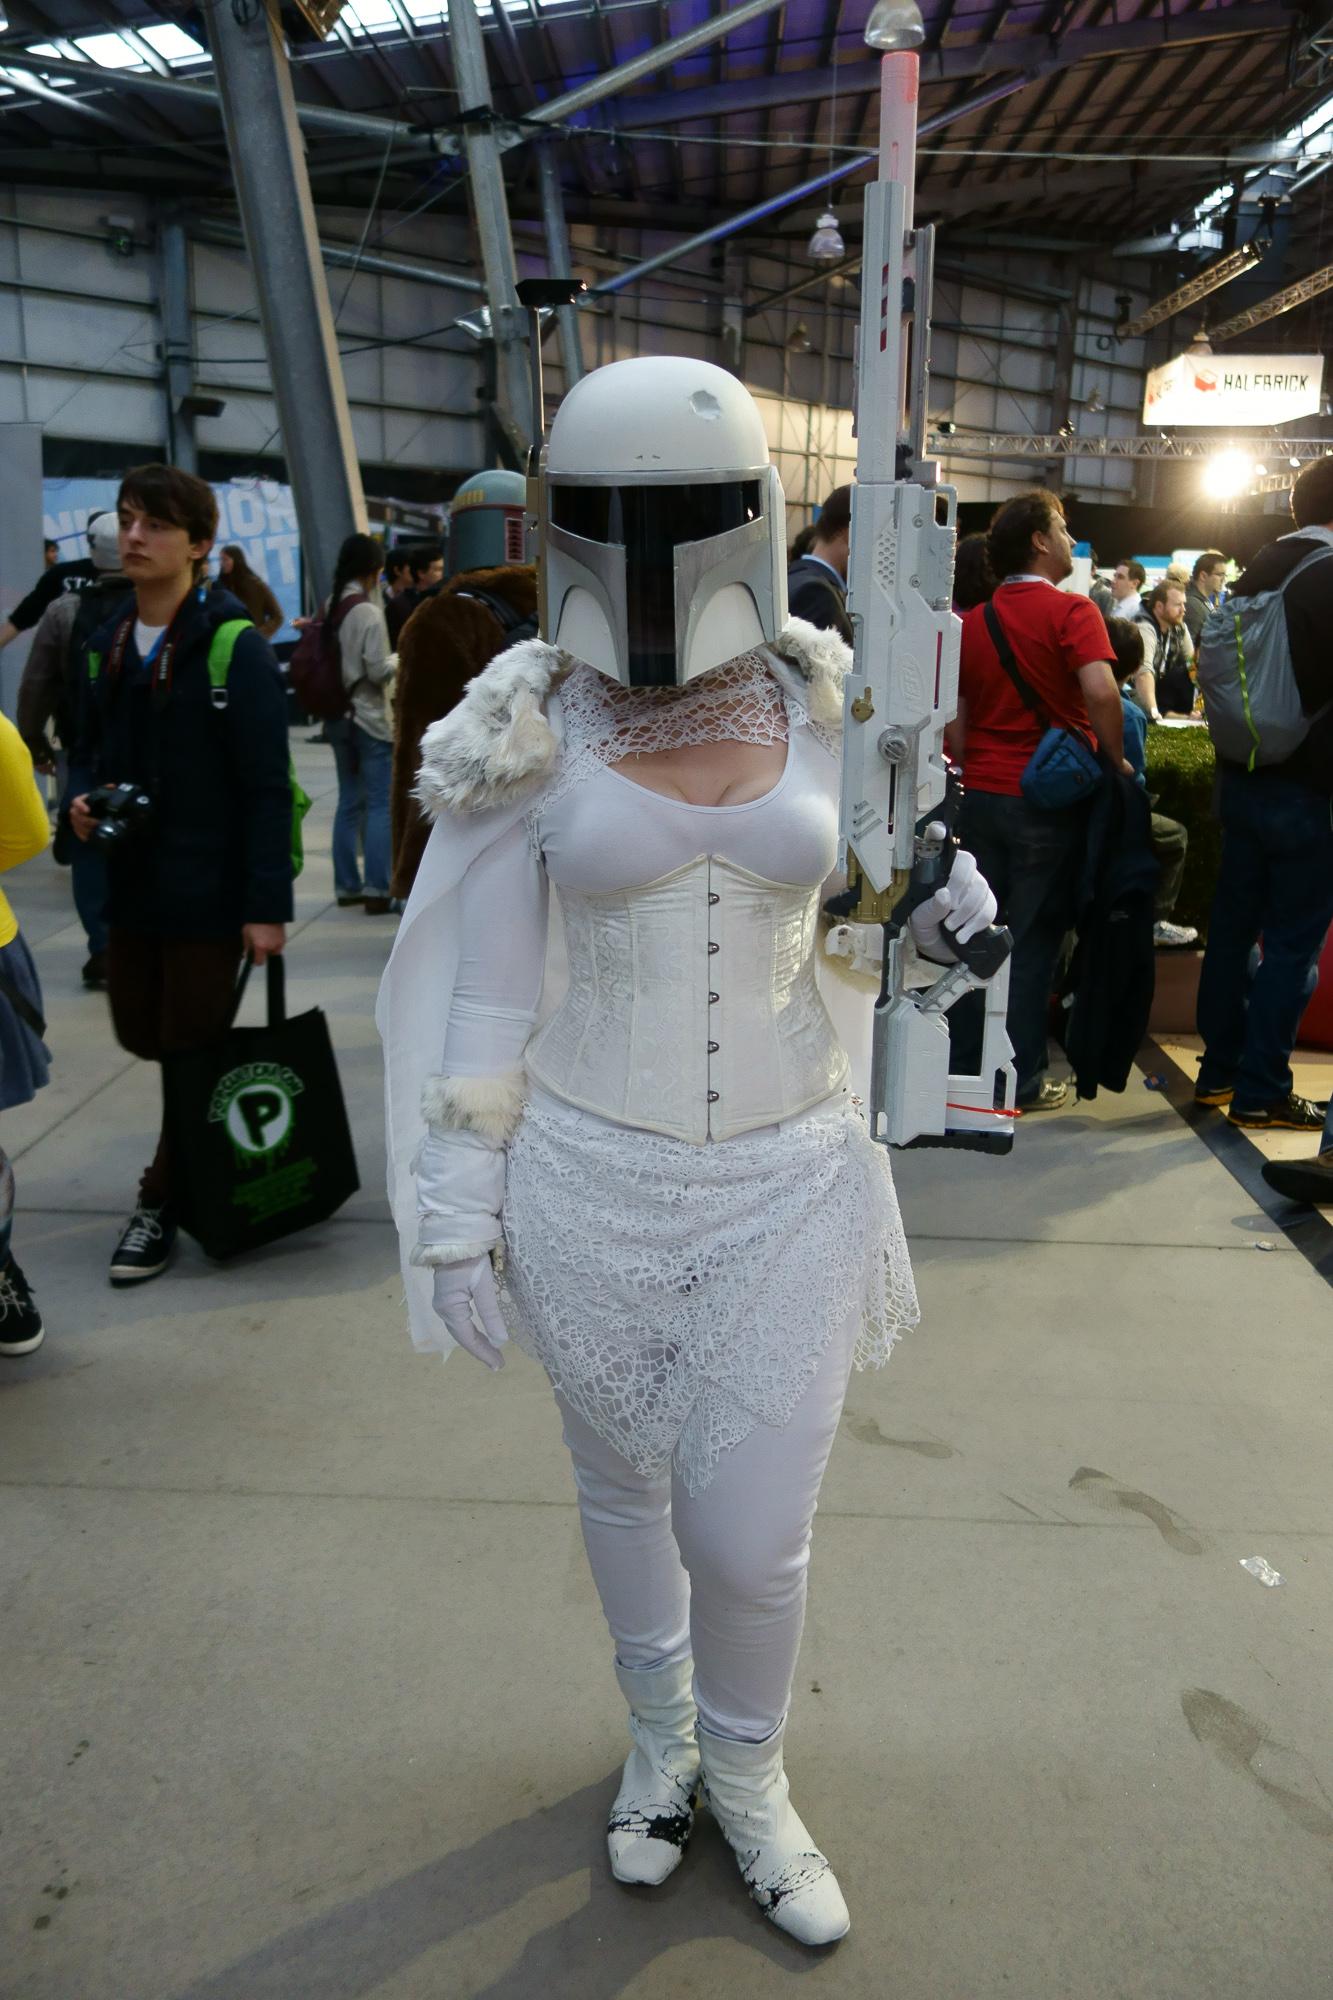 Sexy Stormtrooper? Love the custom paint job on that Longstrike, though!